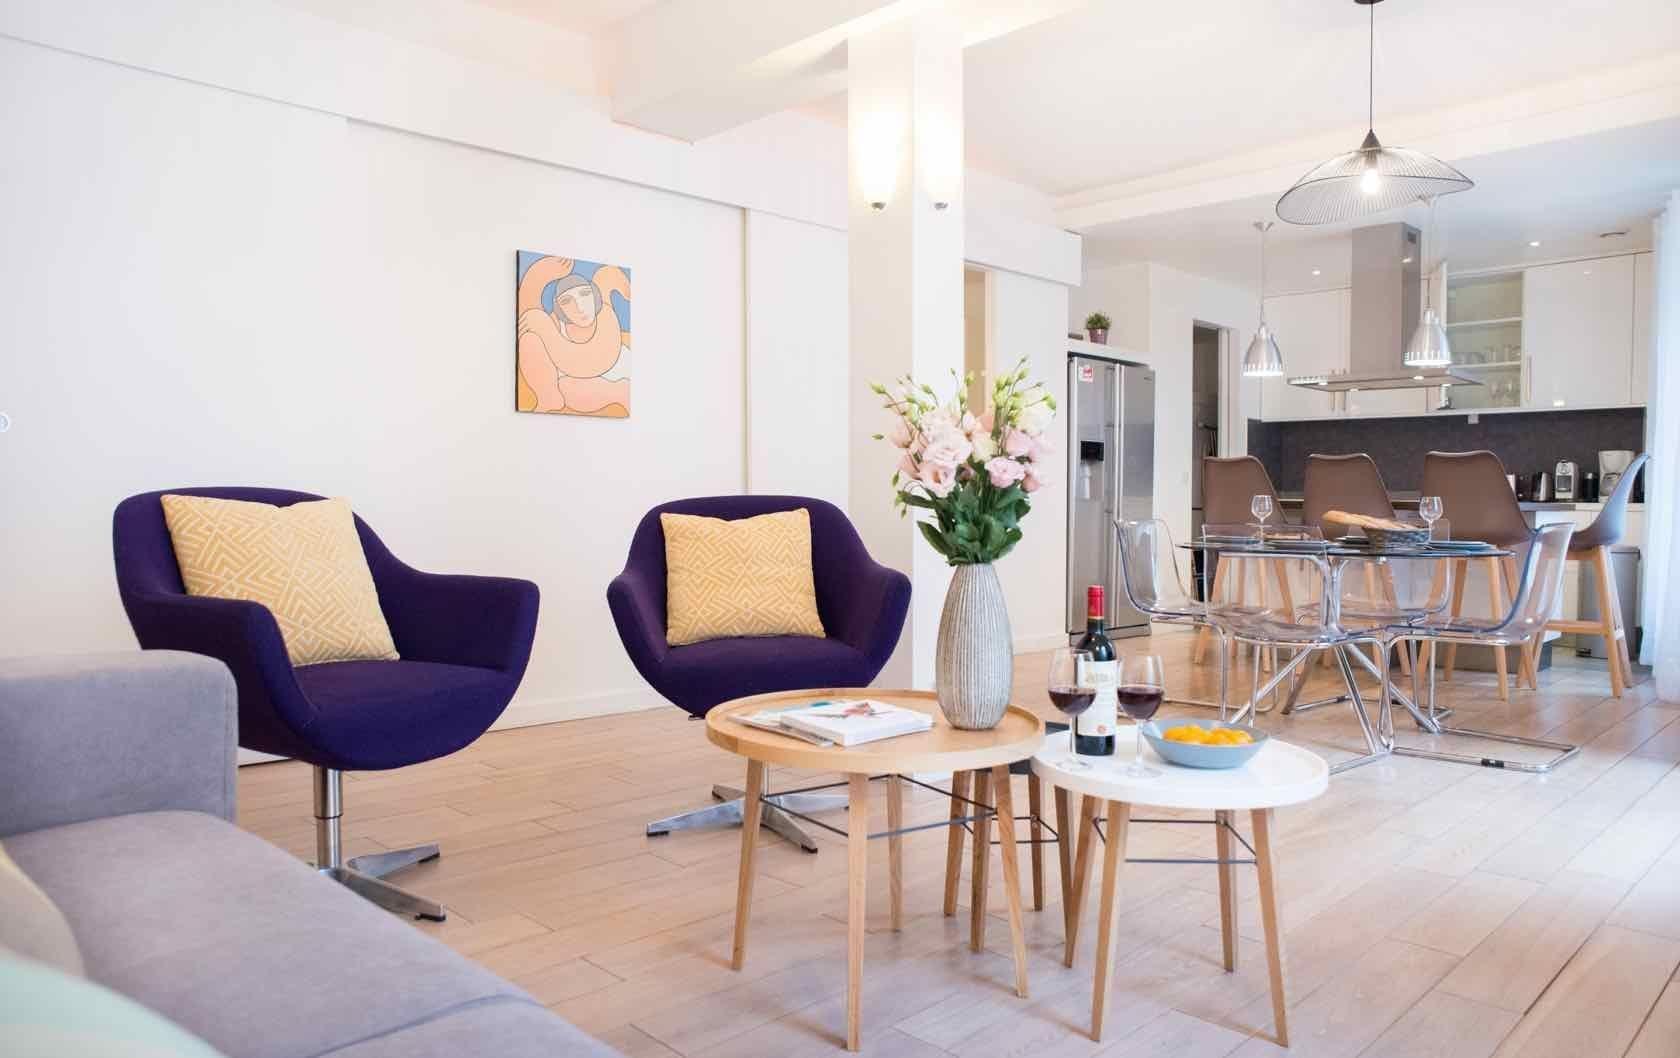 Astonishing Rental Apartment Decorating Ideas 28